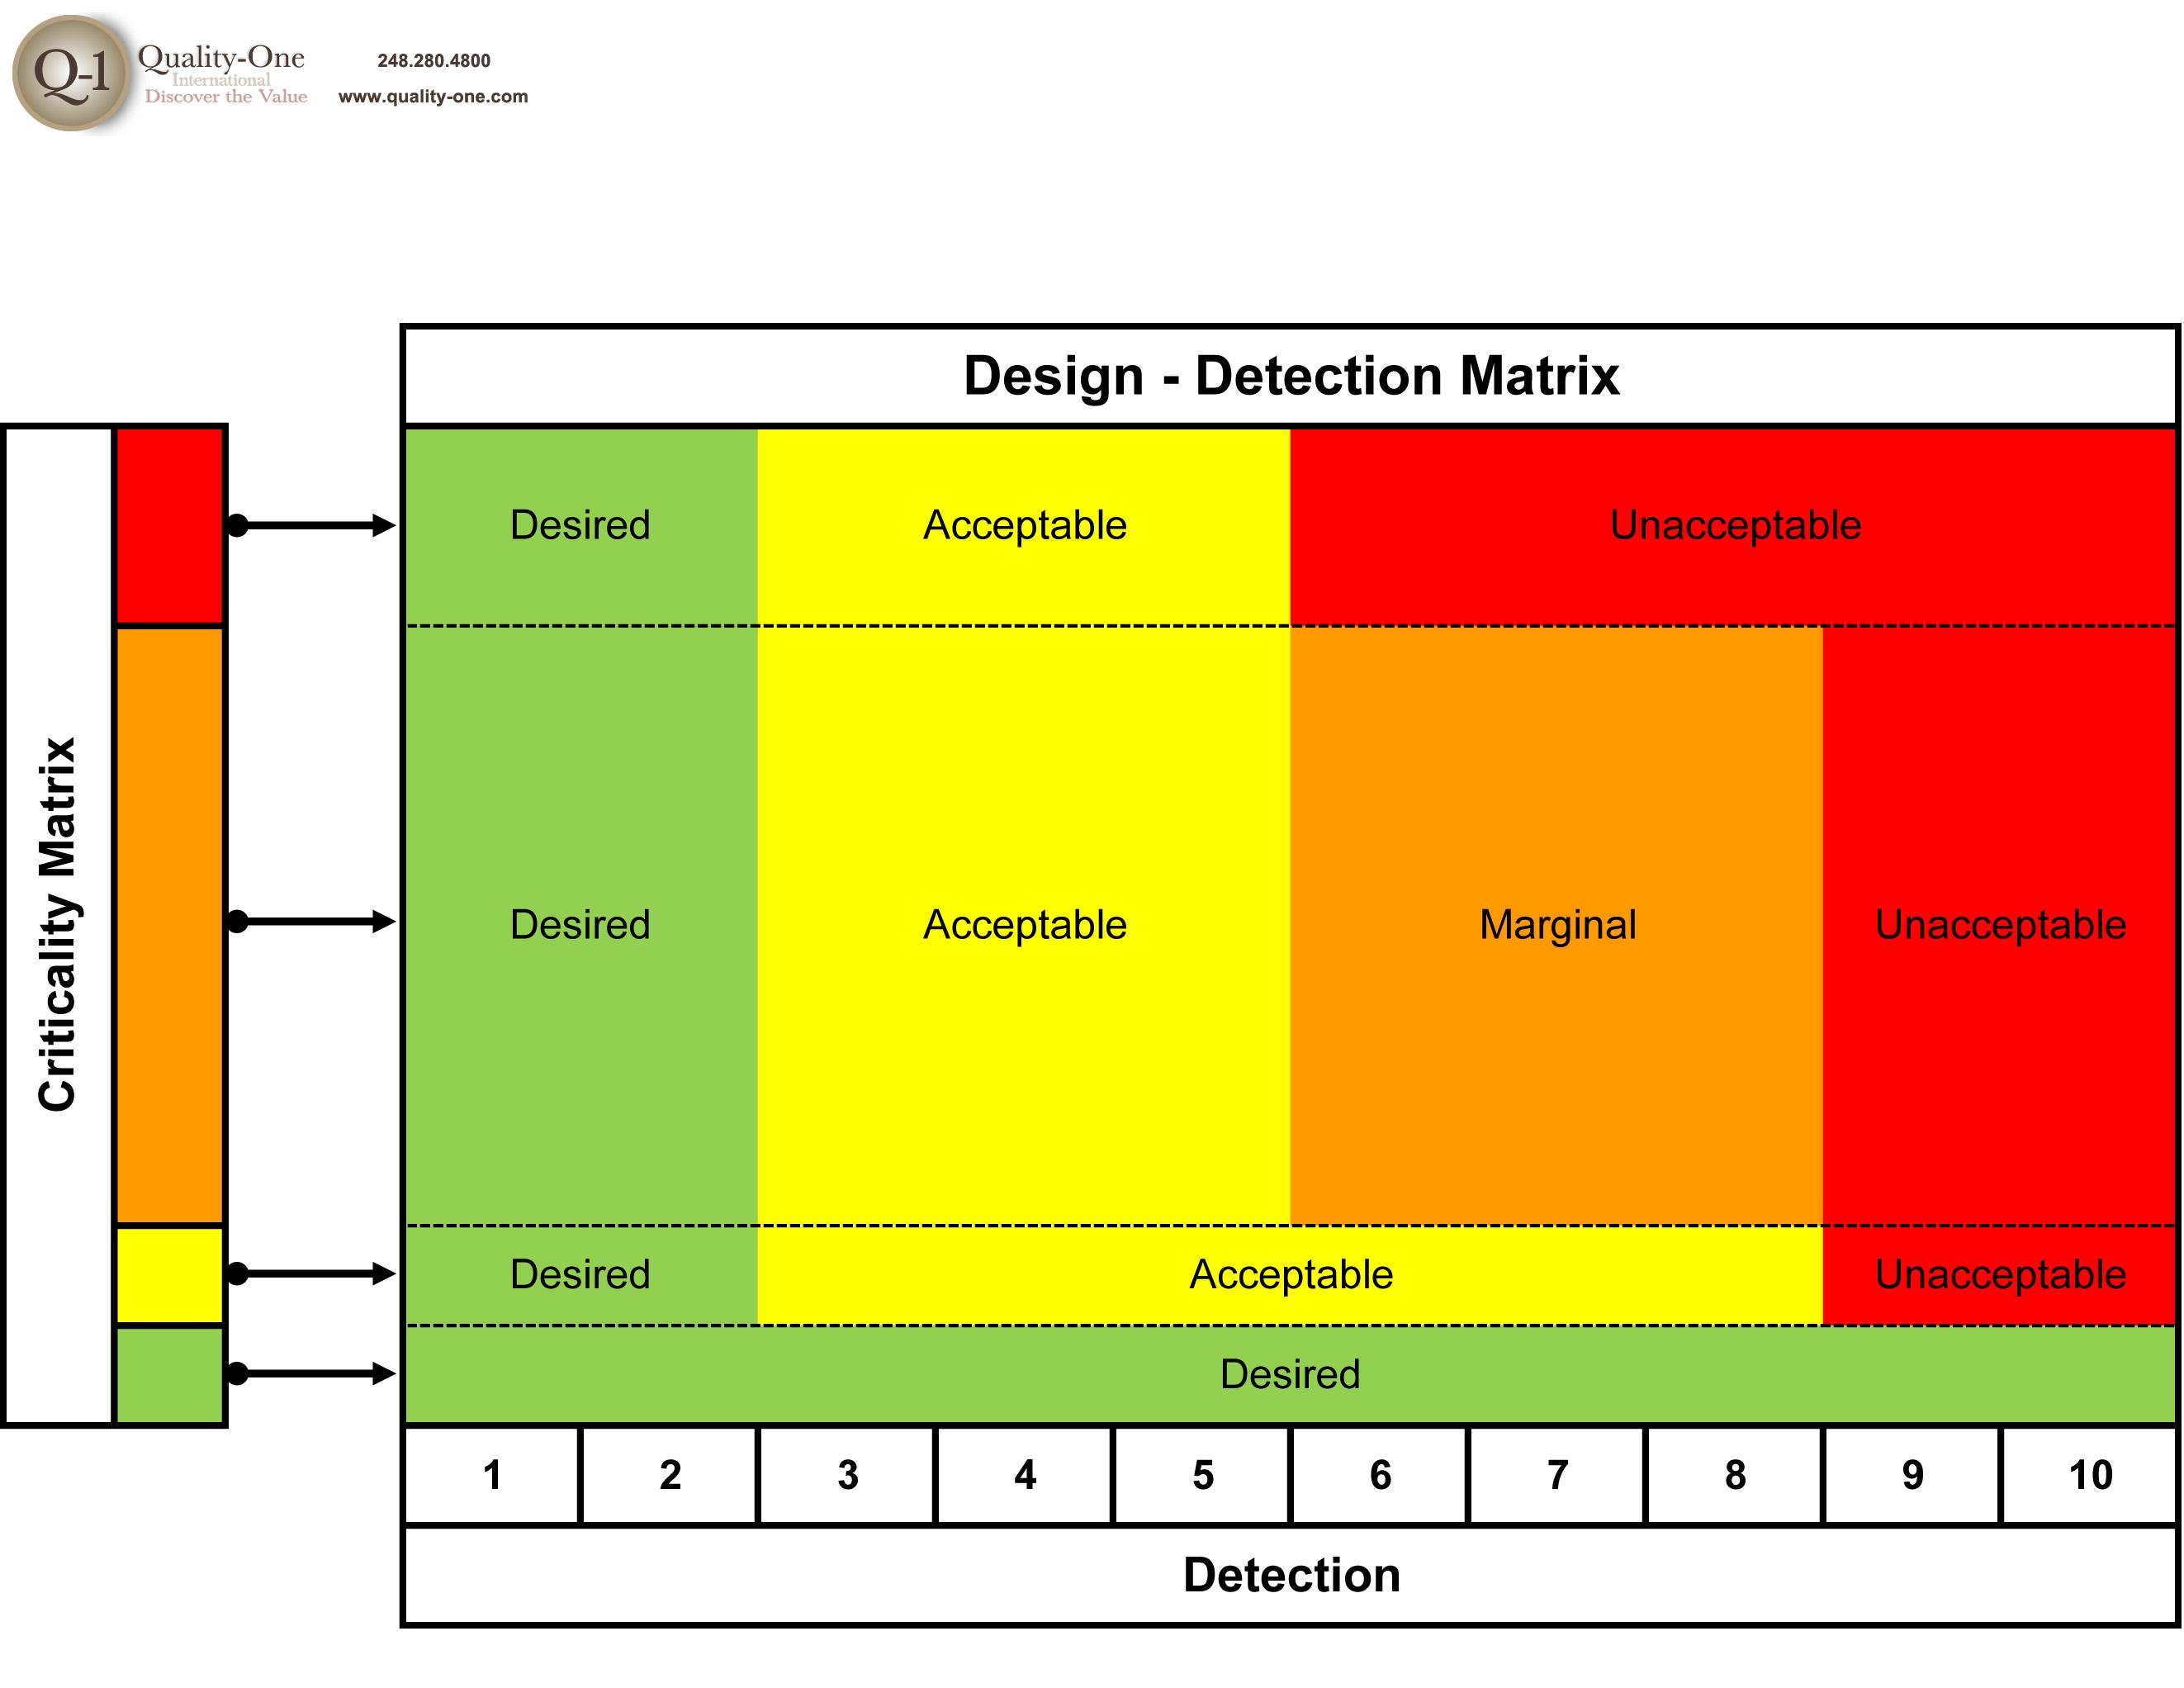 design-detection-matrix-2-23-12